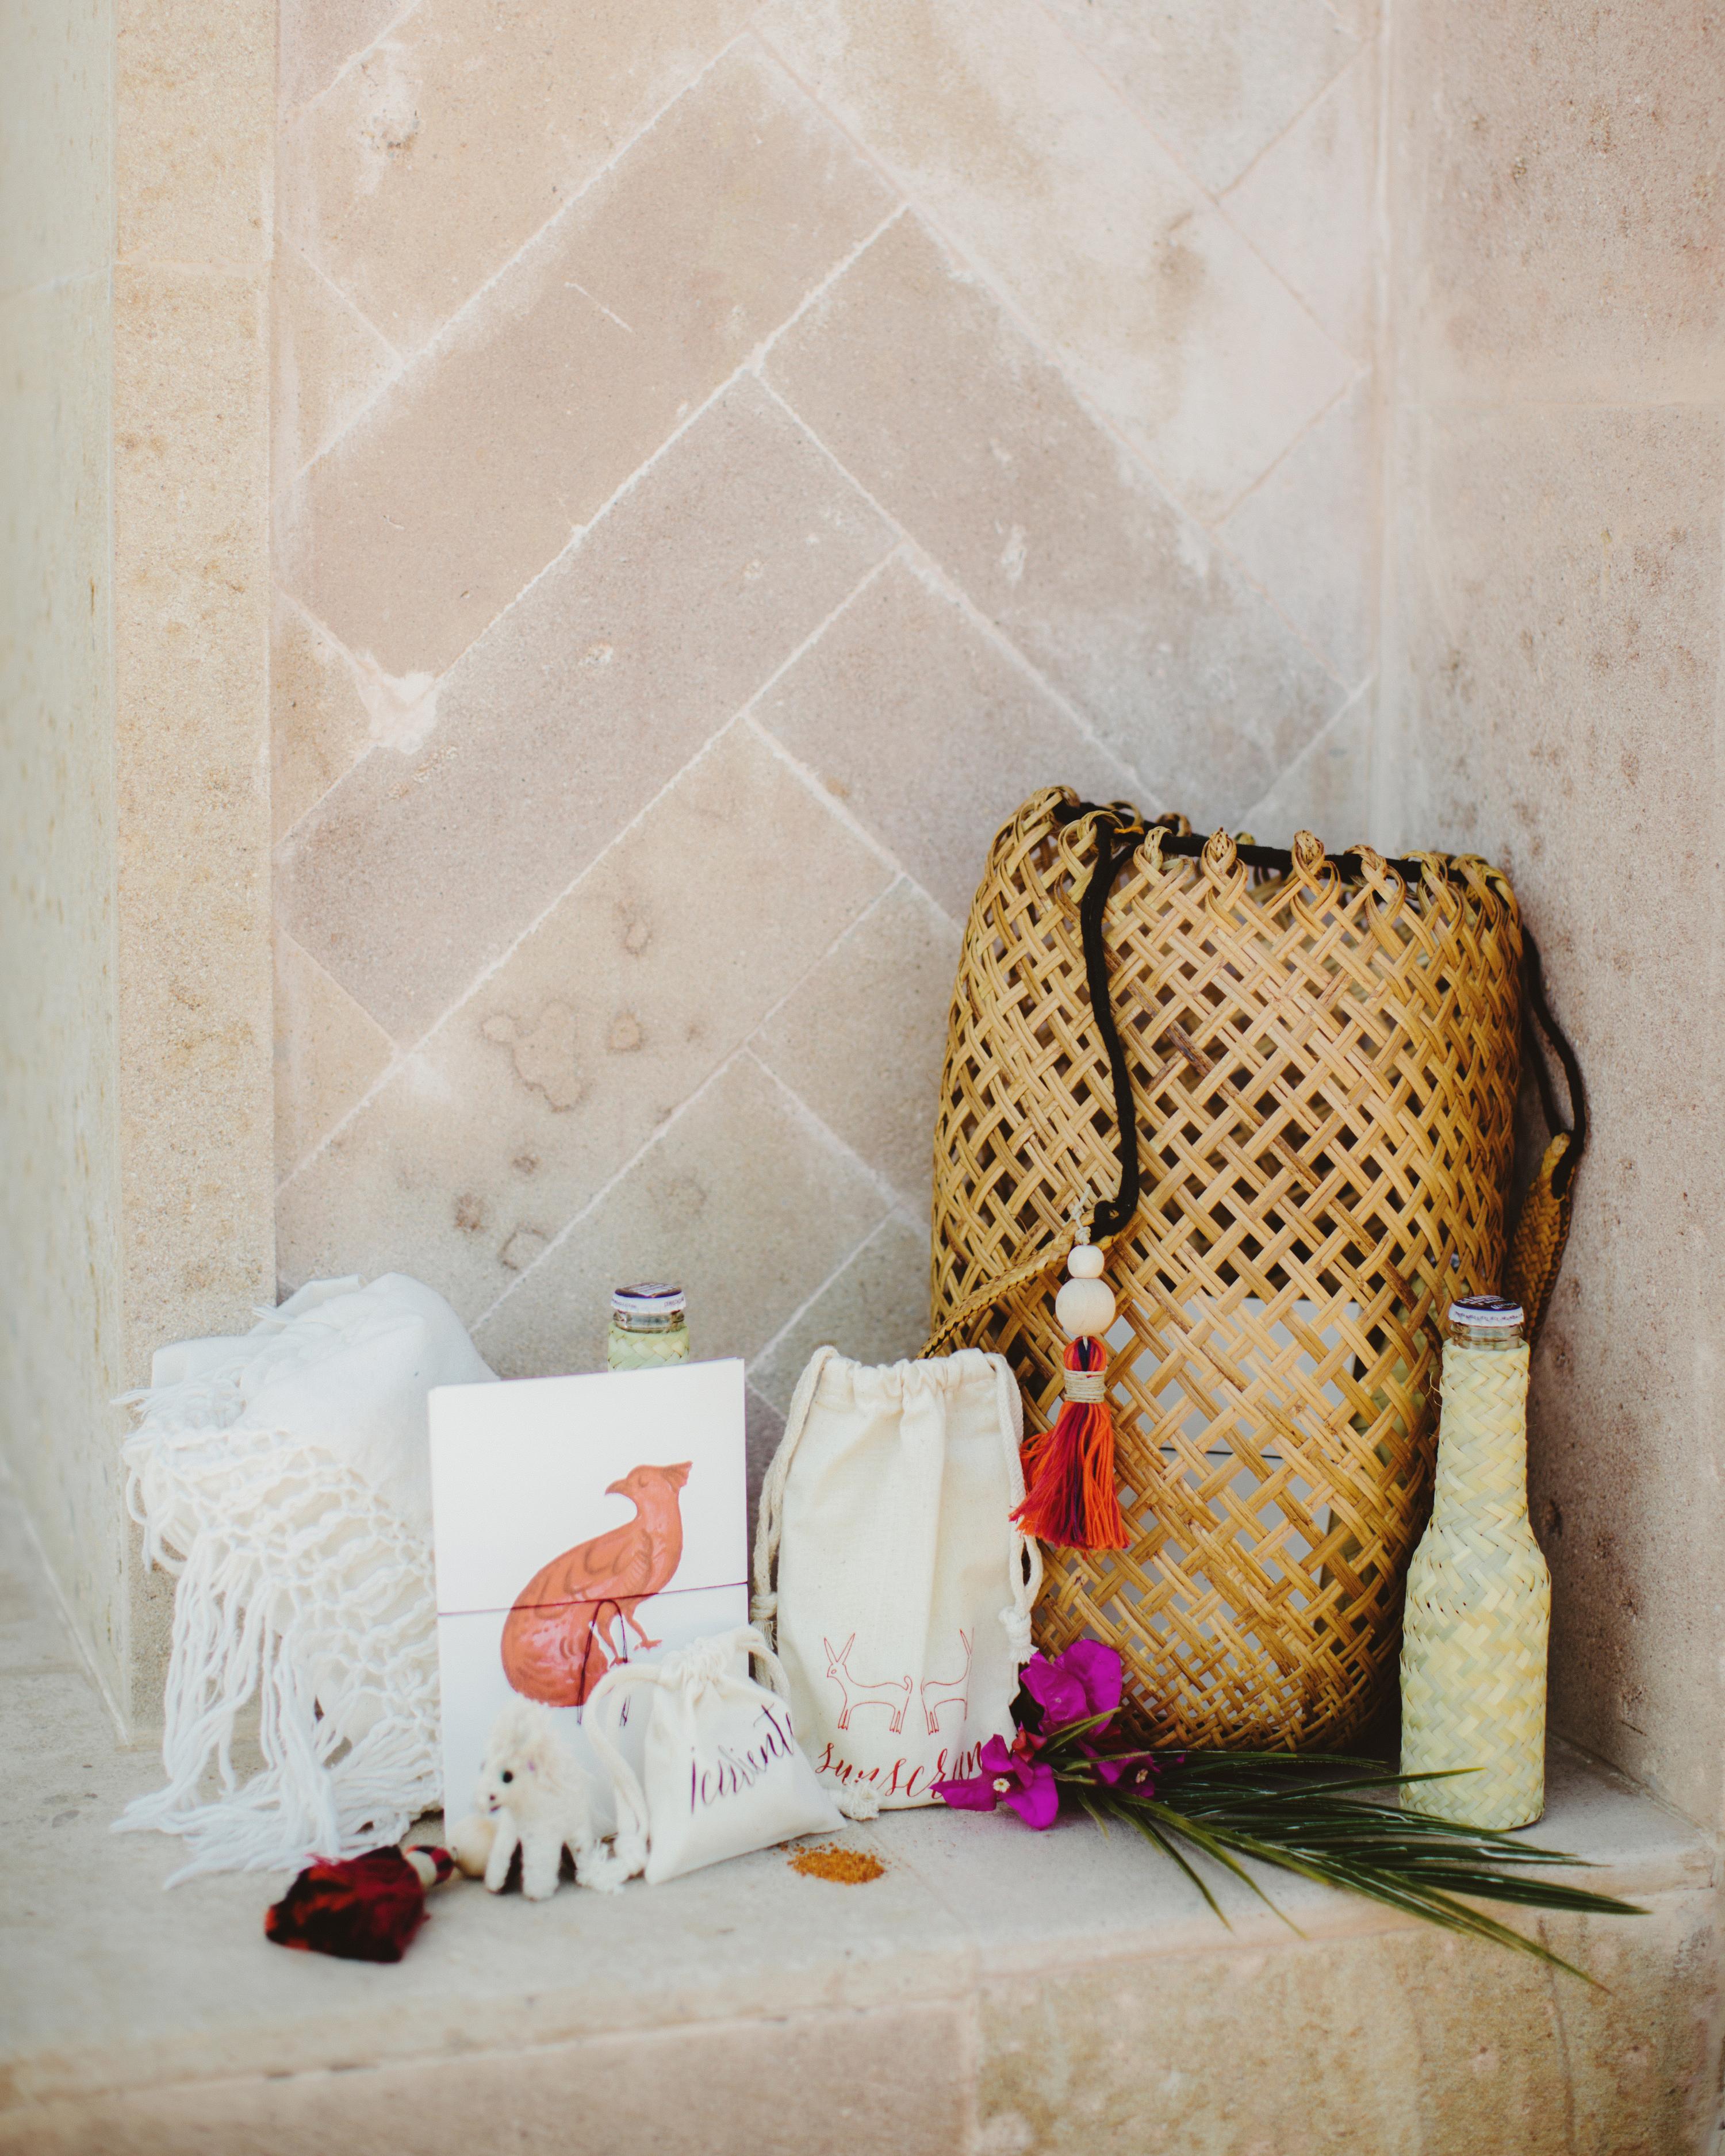 julie-jon-mexico-wedding-0011-s111779.jpg